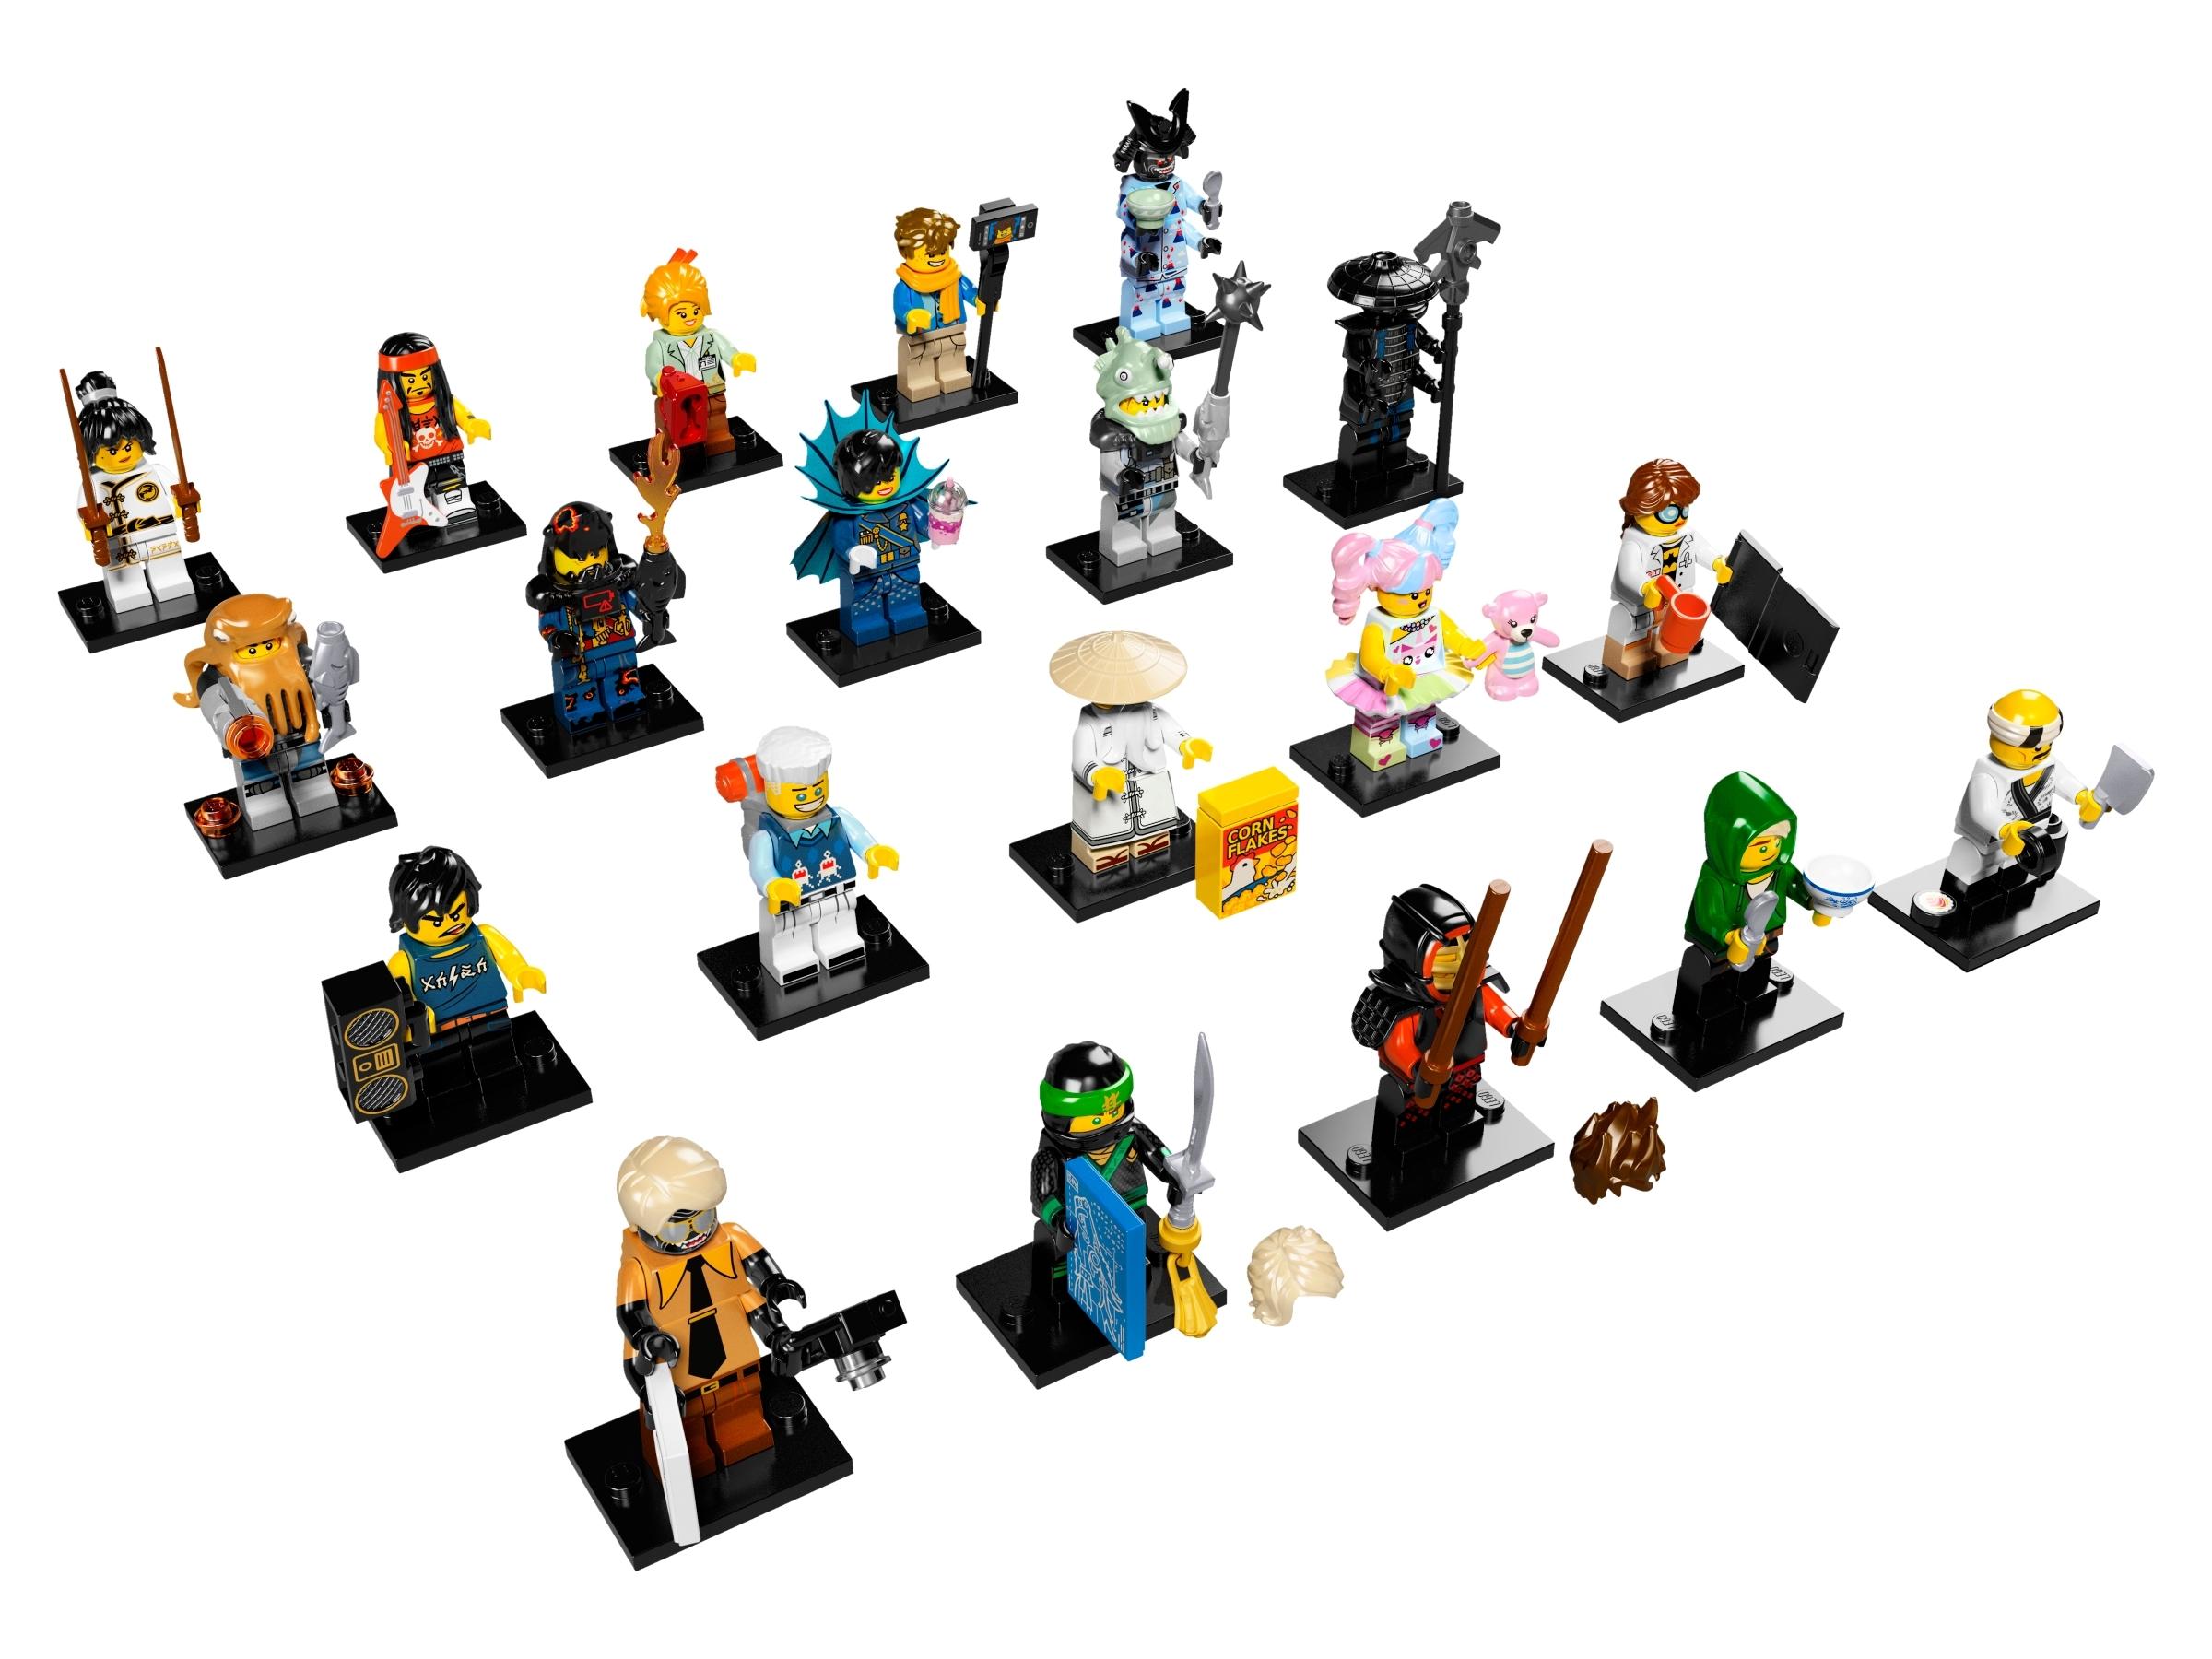 NEW LEGO The Ninjago Movie Minifigures Series 71019 Shark Army Great White